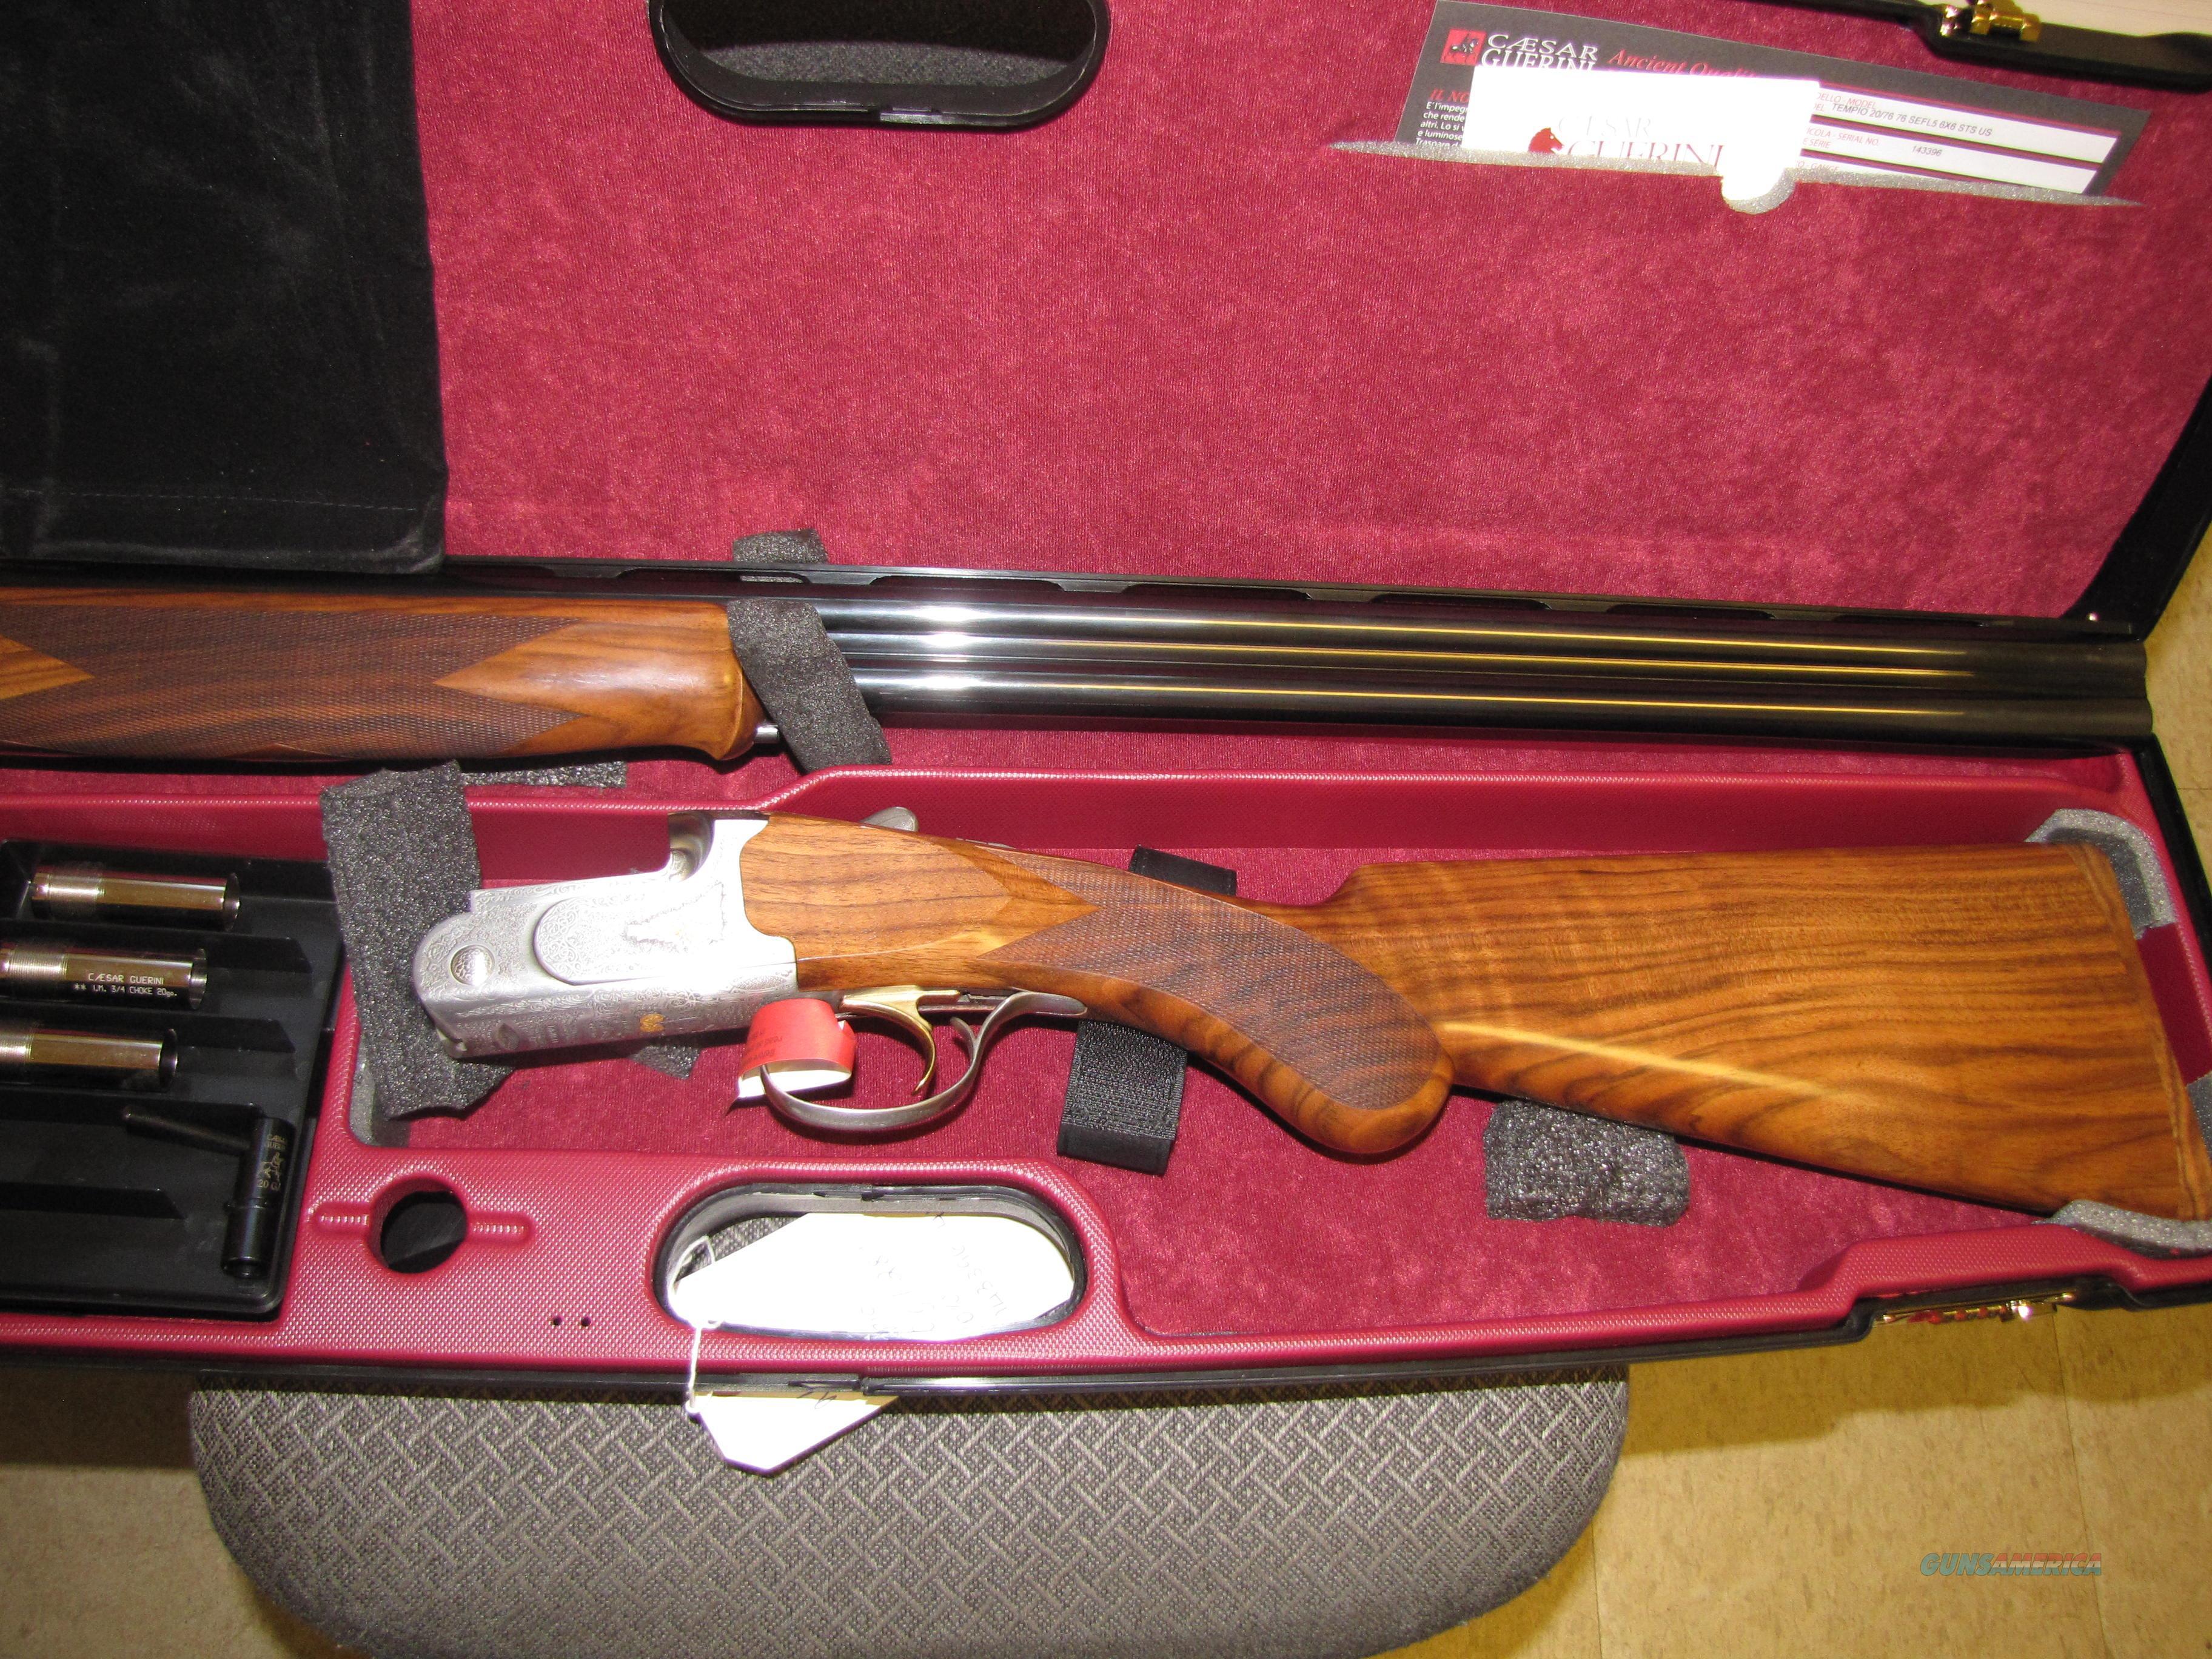 NIB Guerini Tempio 20 gauge with 28 inch ou barrels field model  Guns > Shotguns > Guerini Shotuns